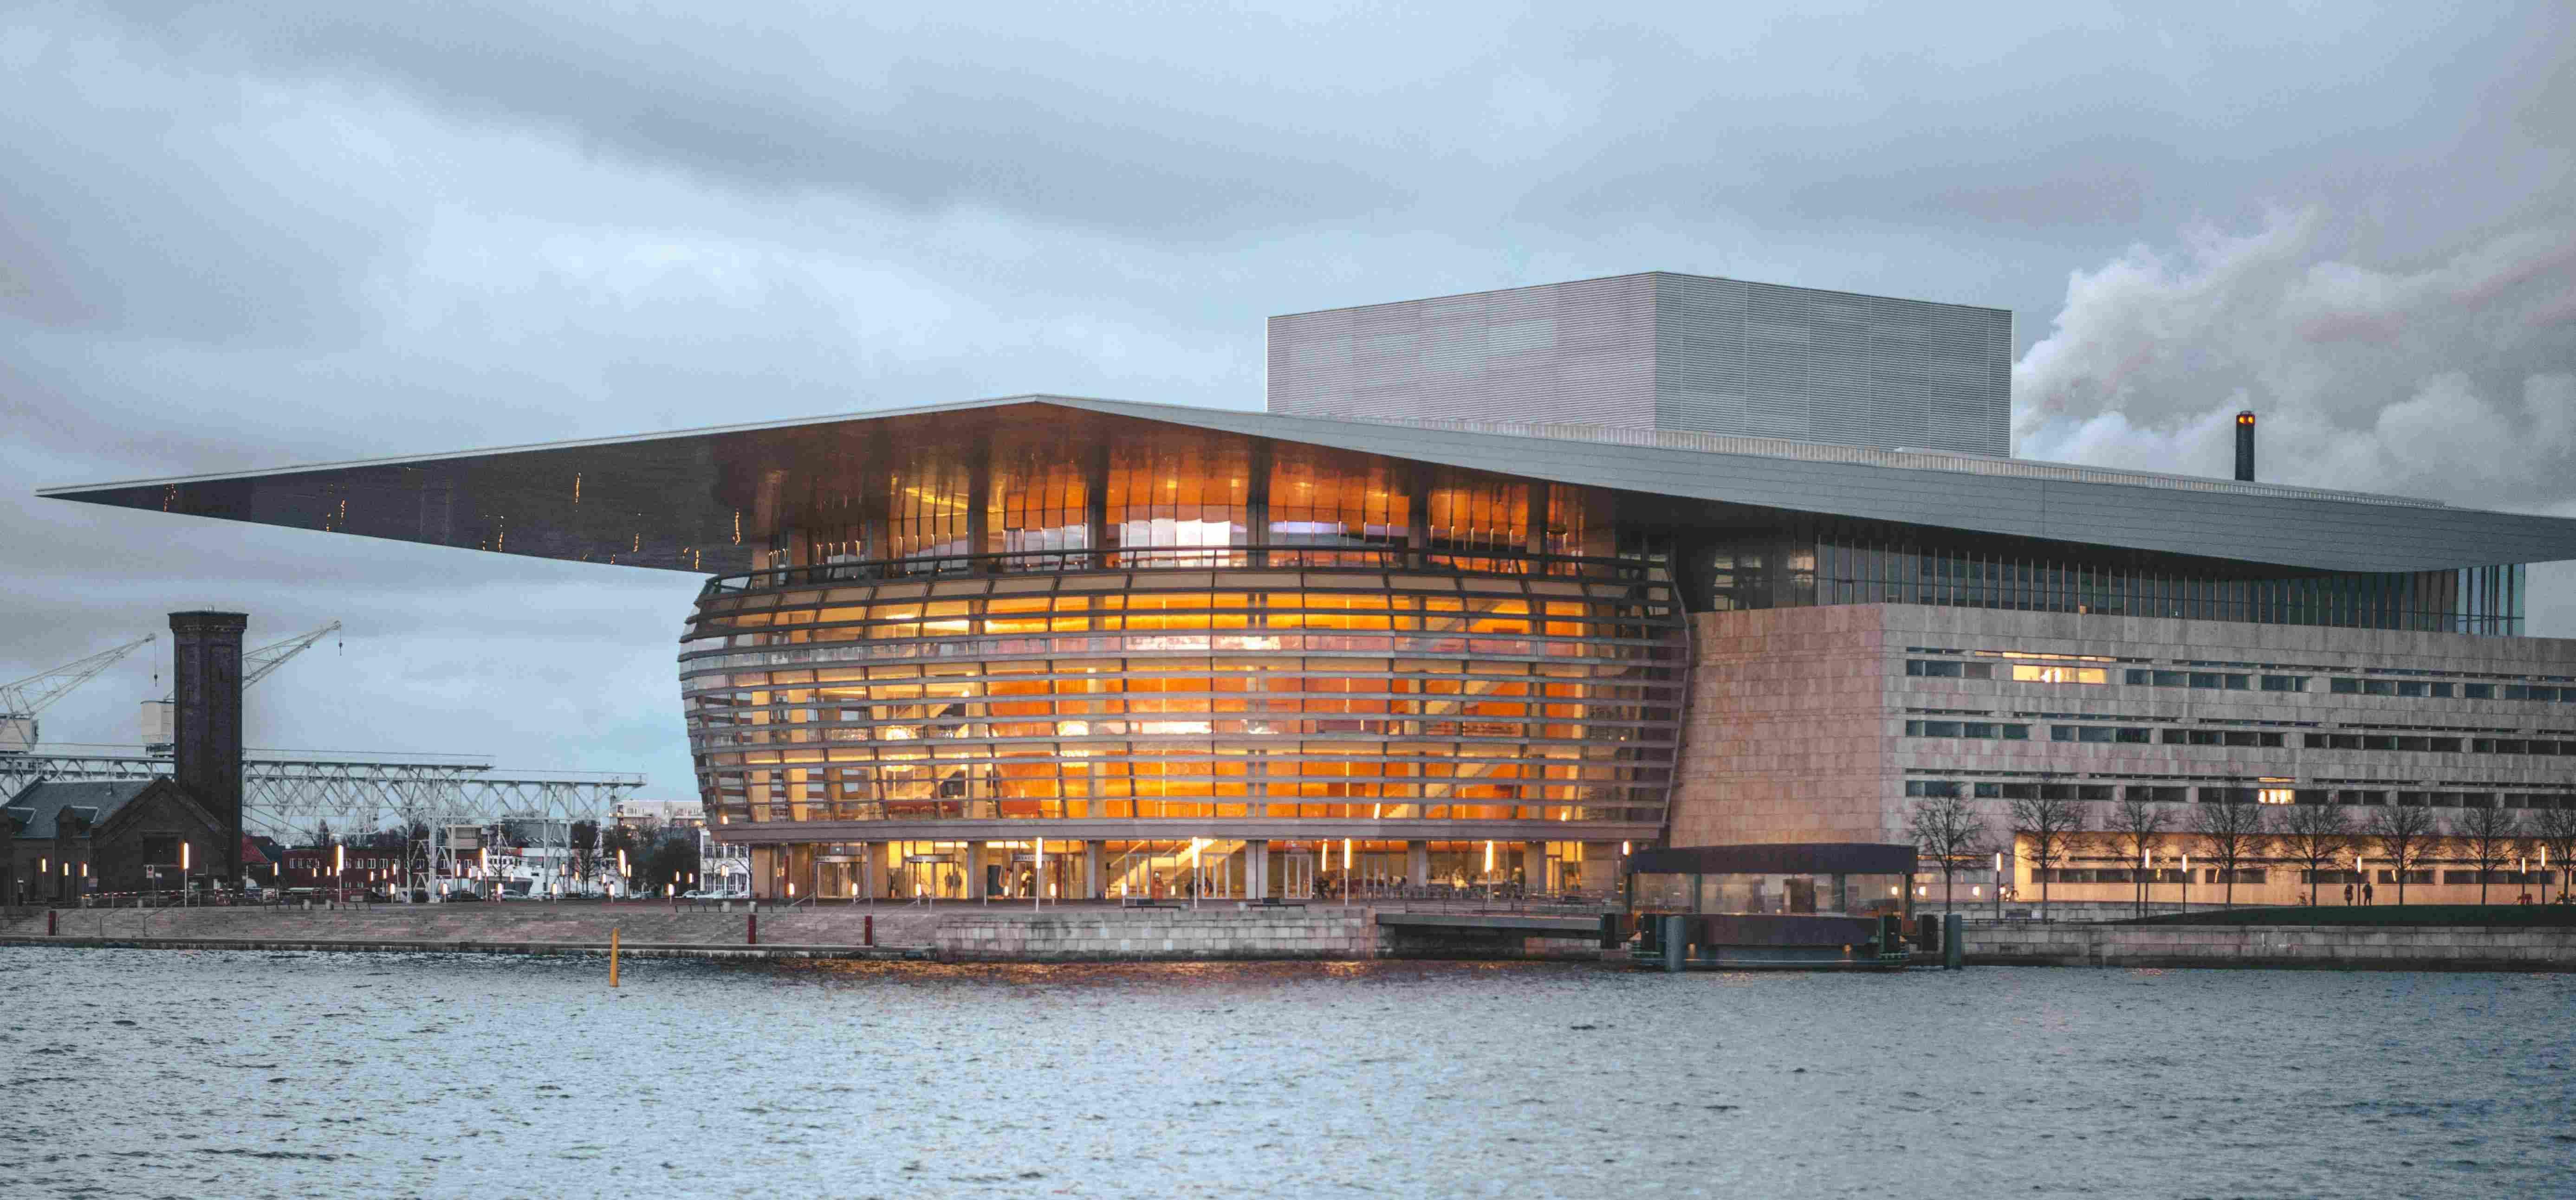 Arquitetura em Copenhague: Opera House, do arquiteto Henning Larsen